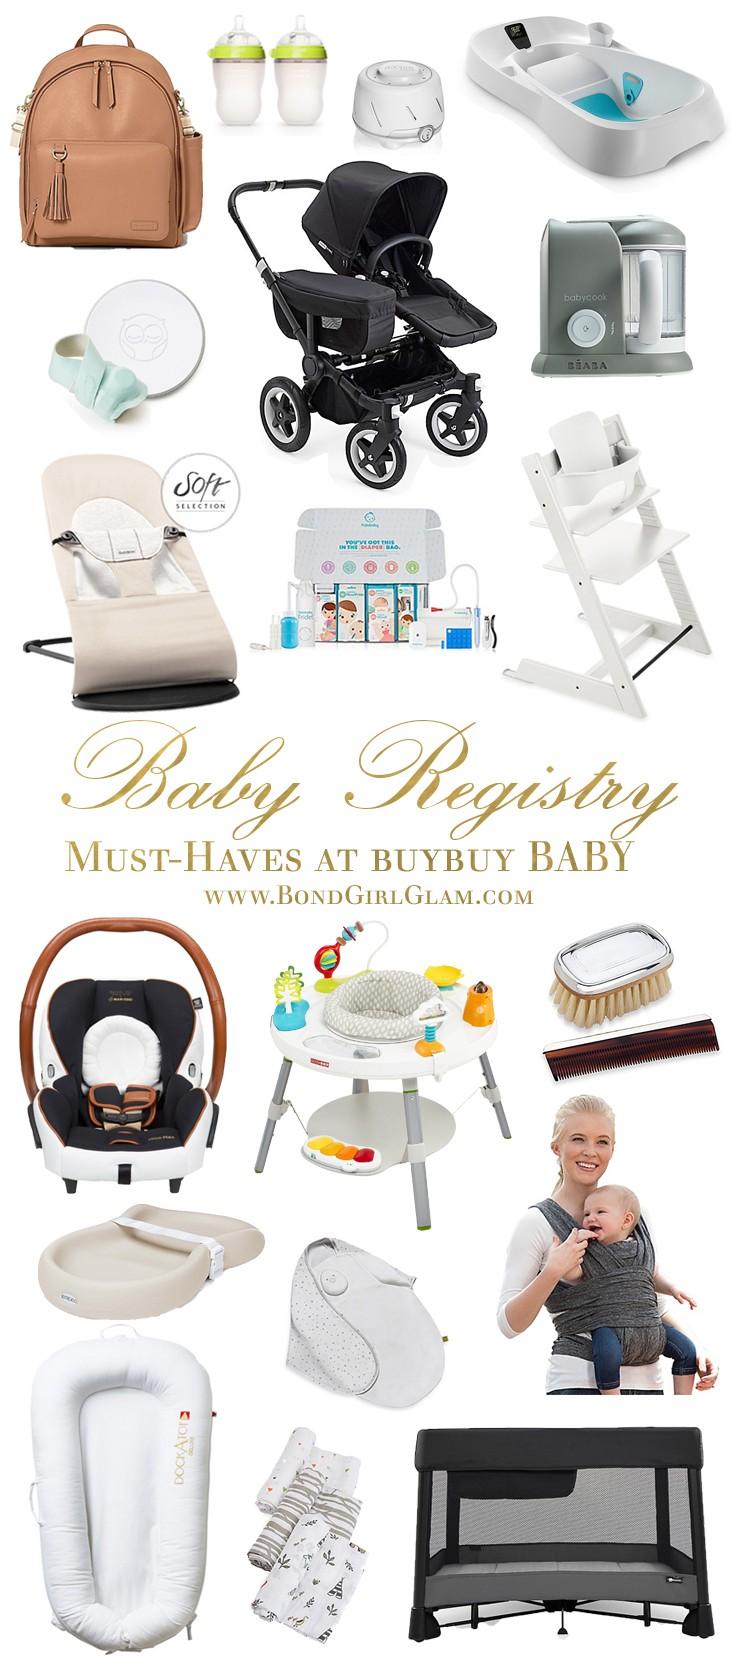 My Baby Registry Must Haves At Buybuy Baby Bondgirlglam Com A